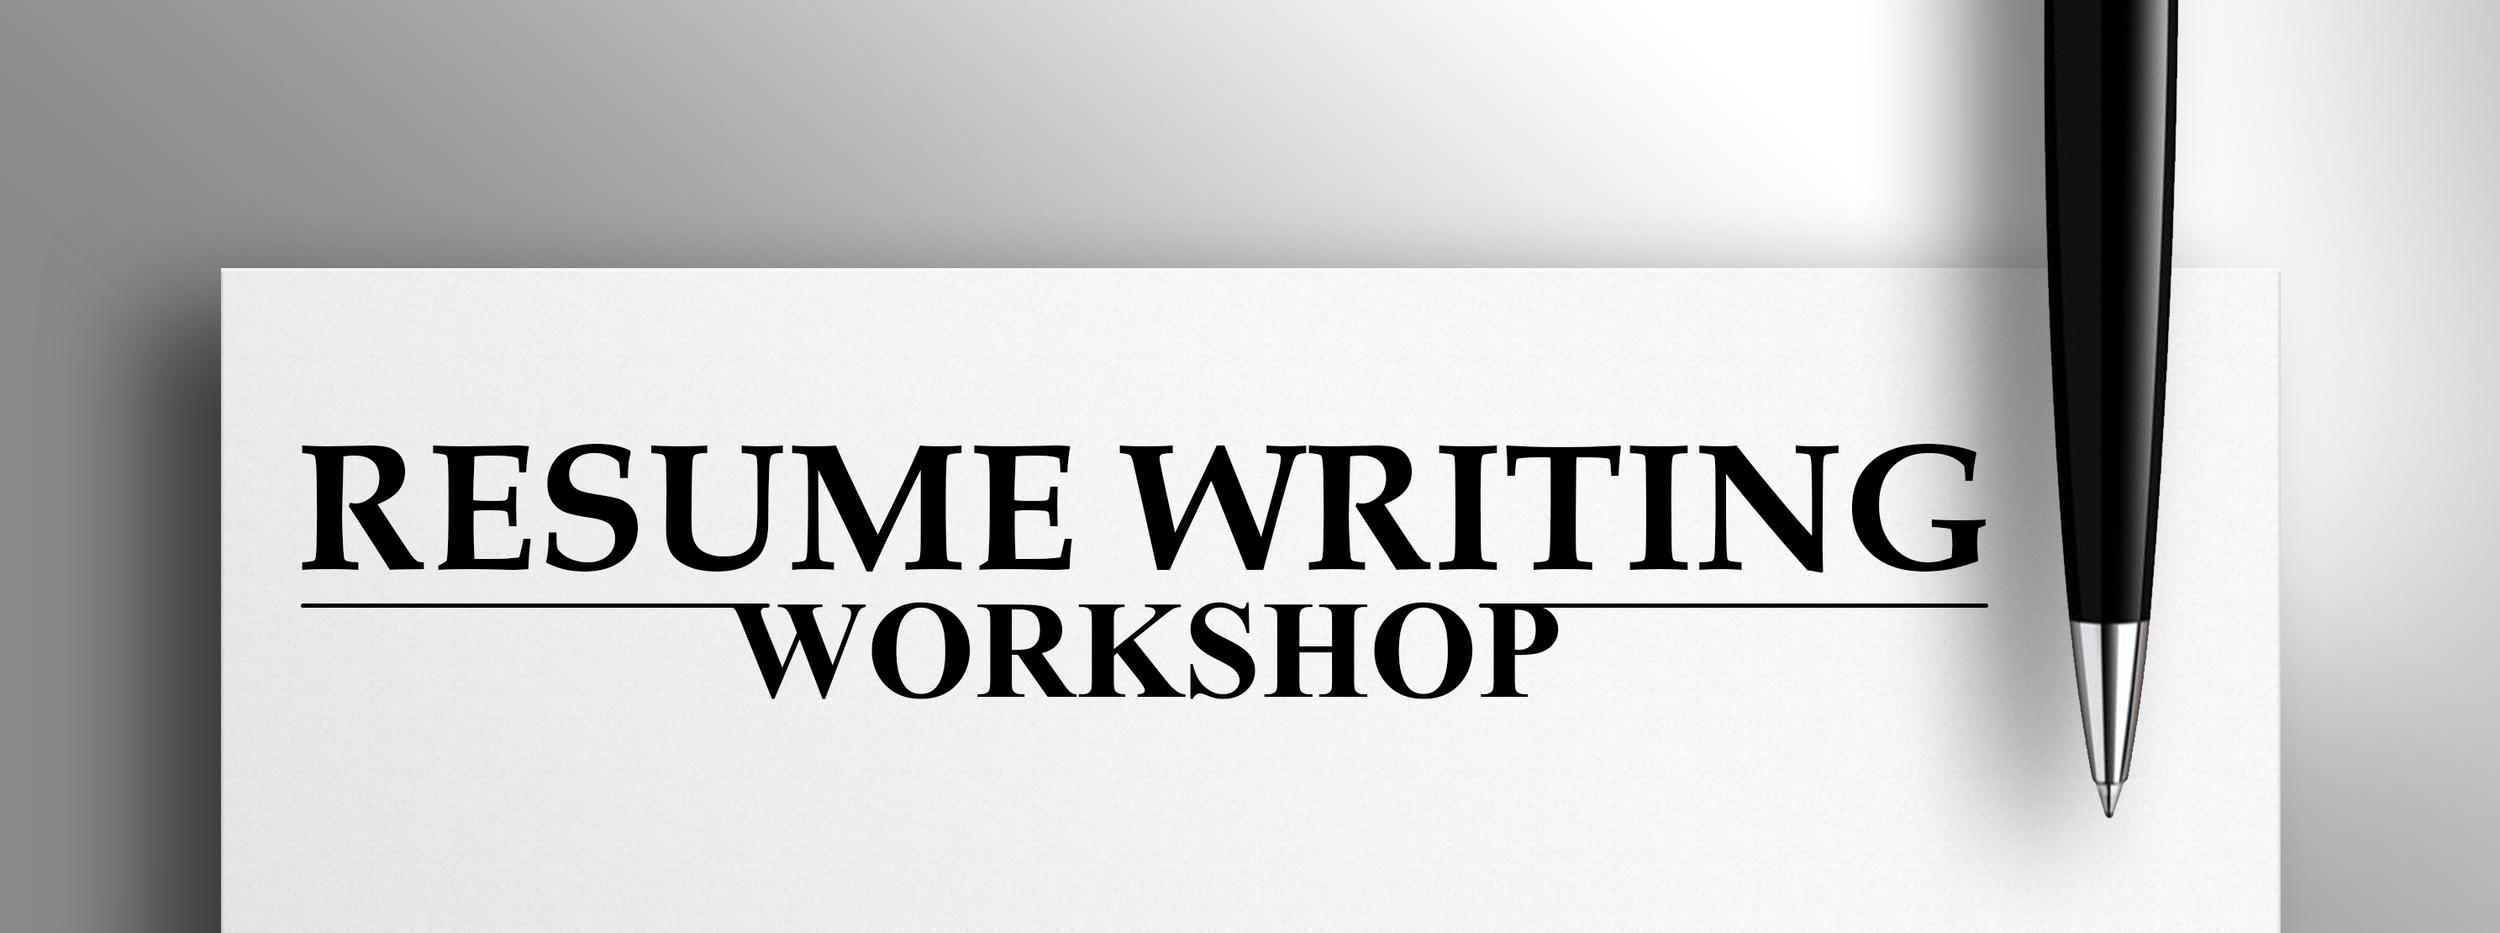 resume writing workshop alliance center for independence